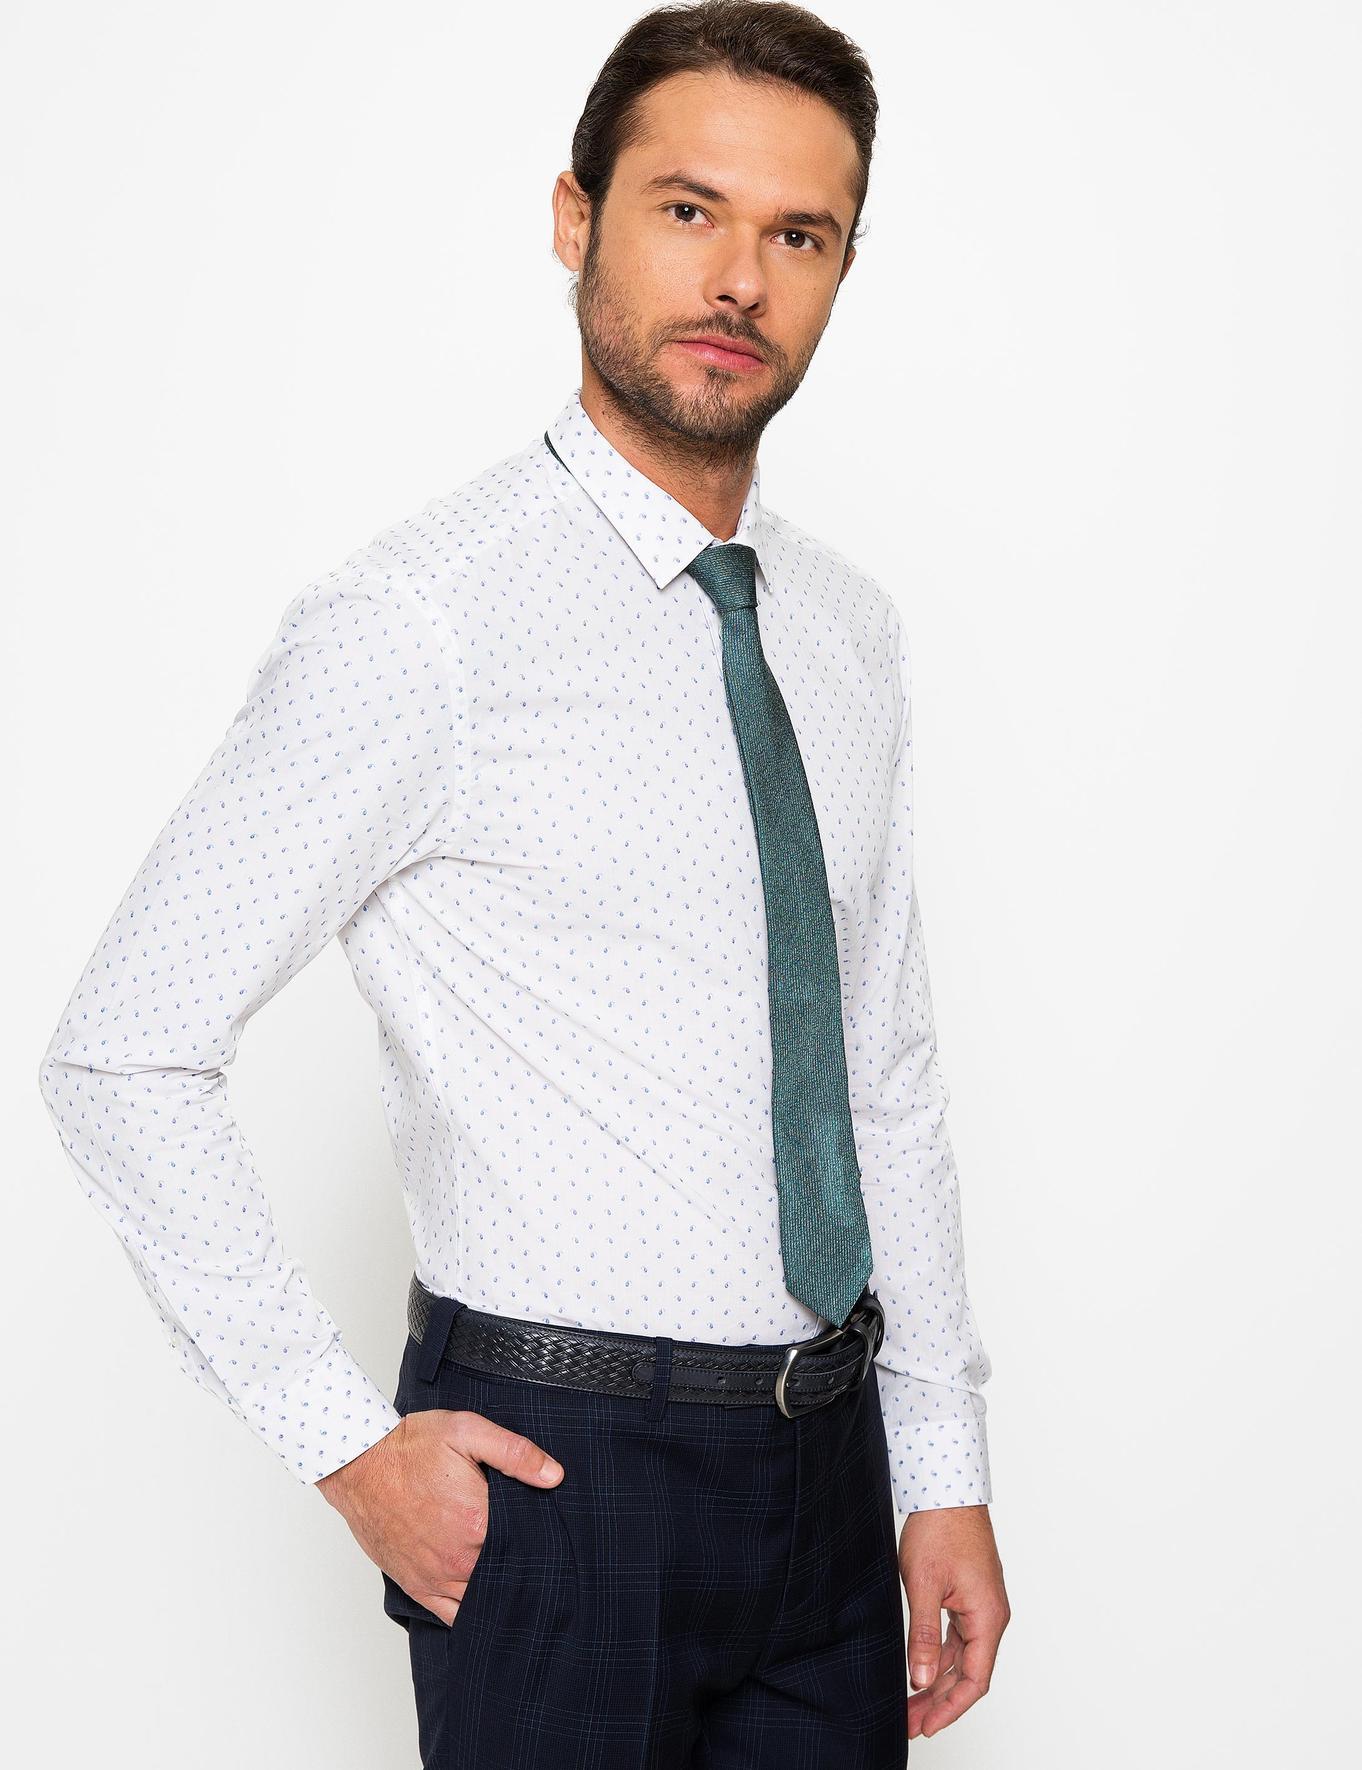 Beyaz Slim Fit Gömlek - 50185957004